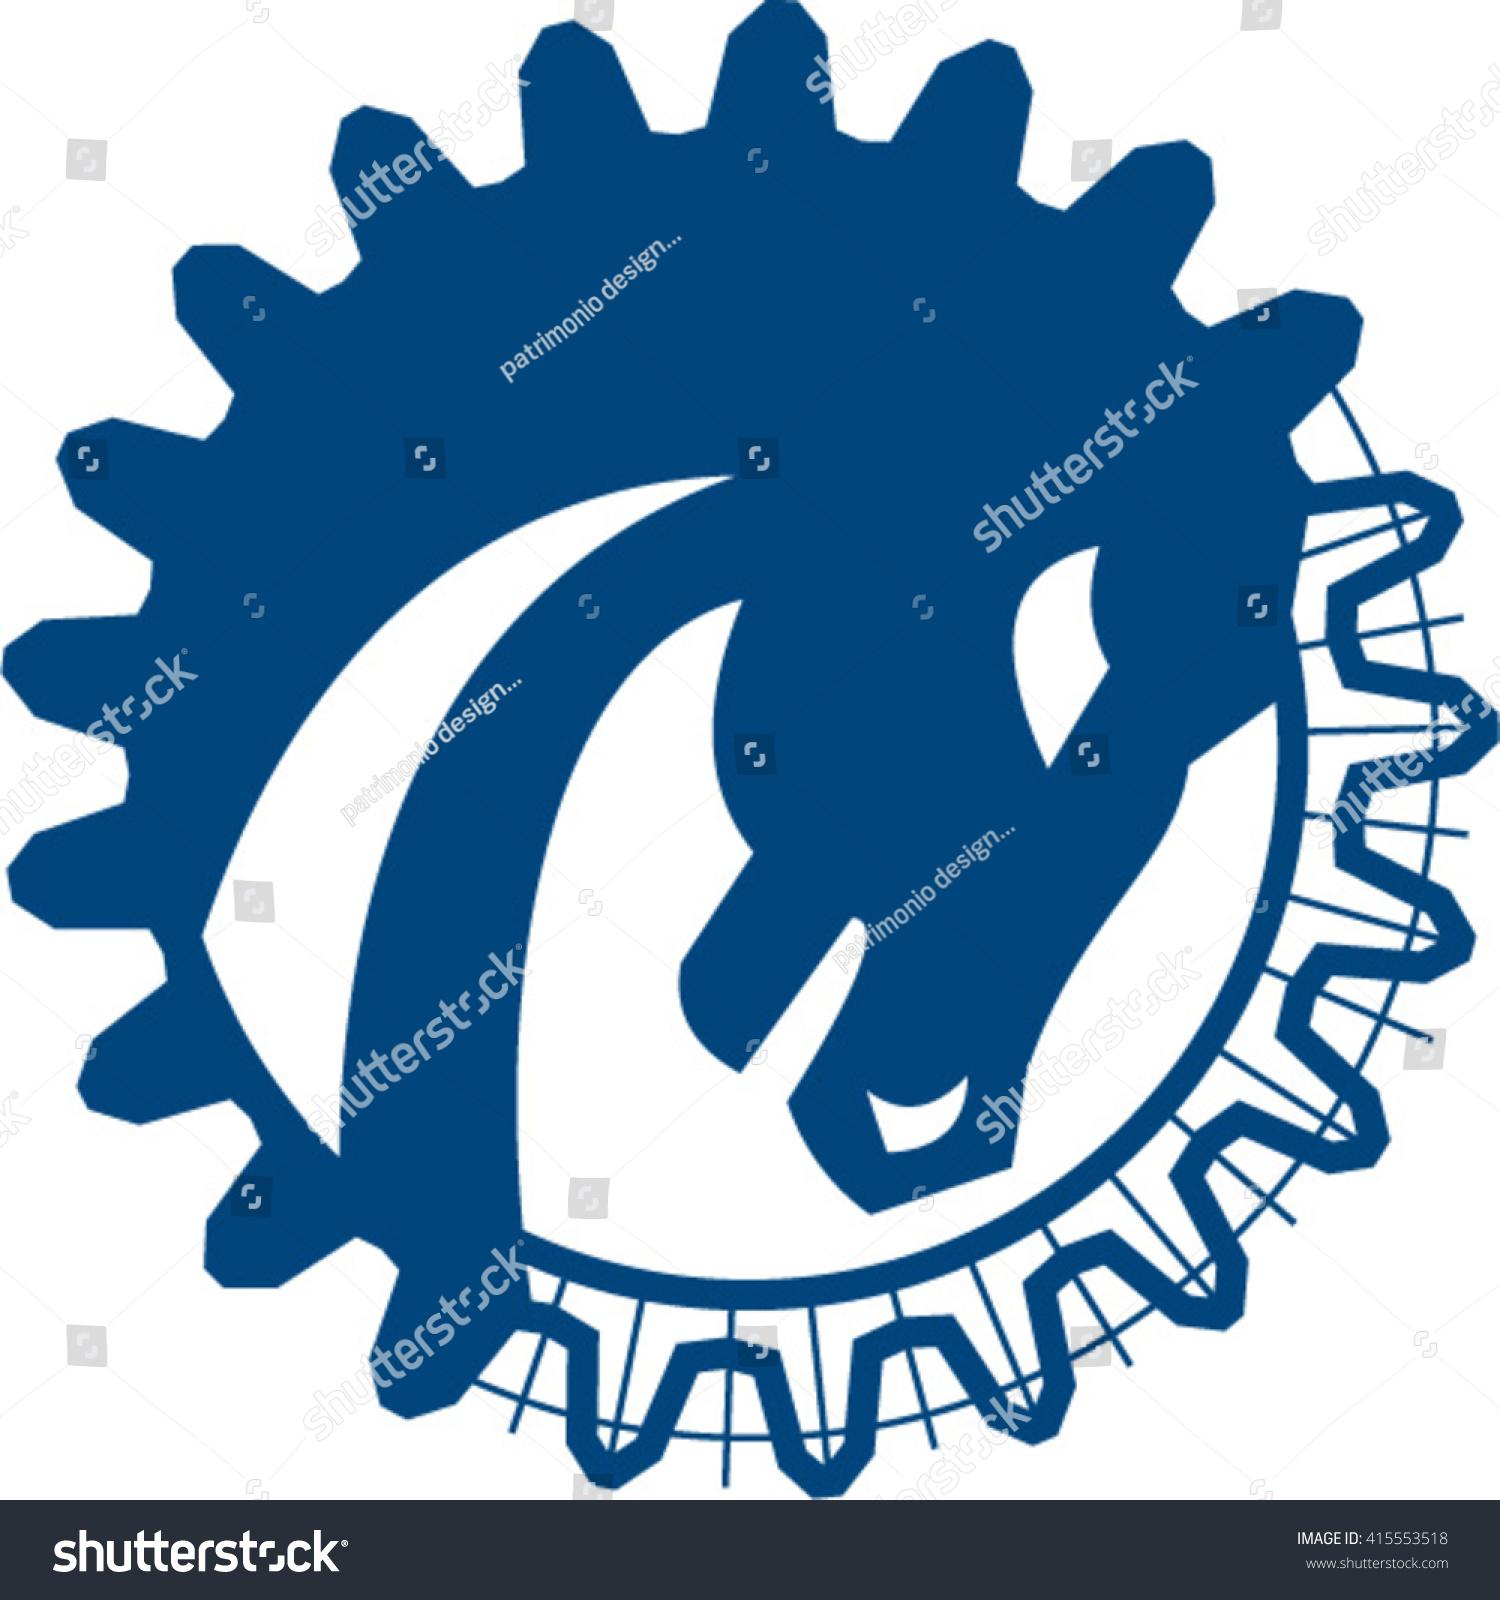 Vector De Stock Libre De Regalias Sobre Illustration Blue War Horse Head Side415553518